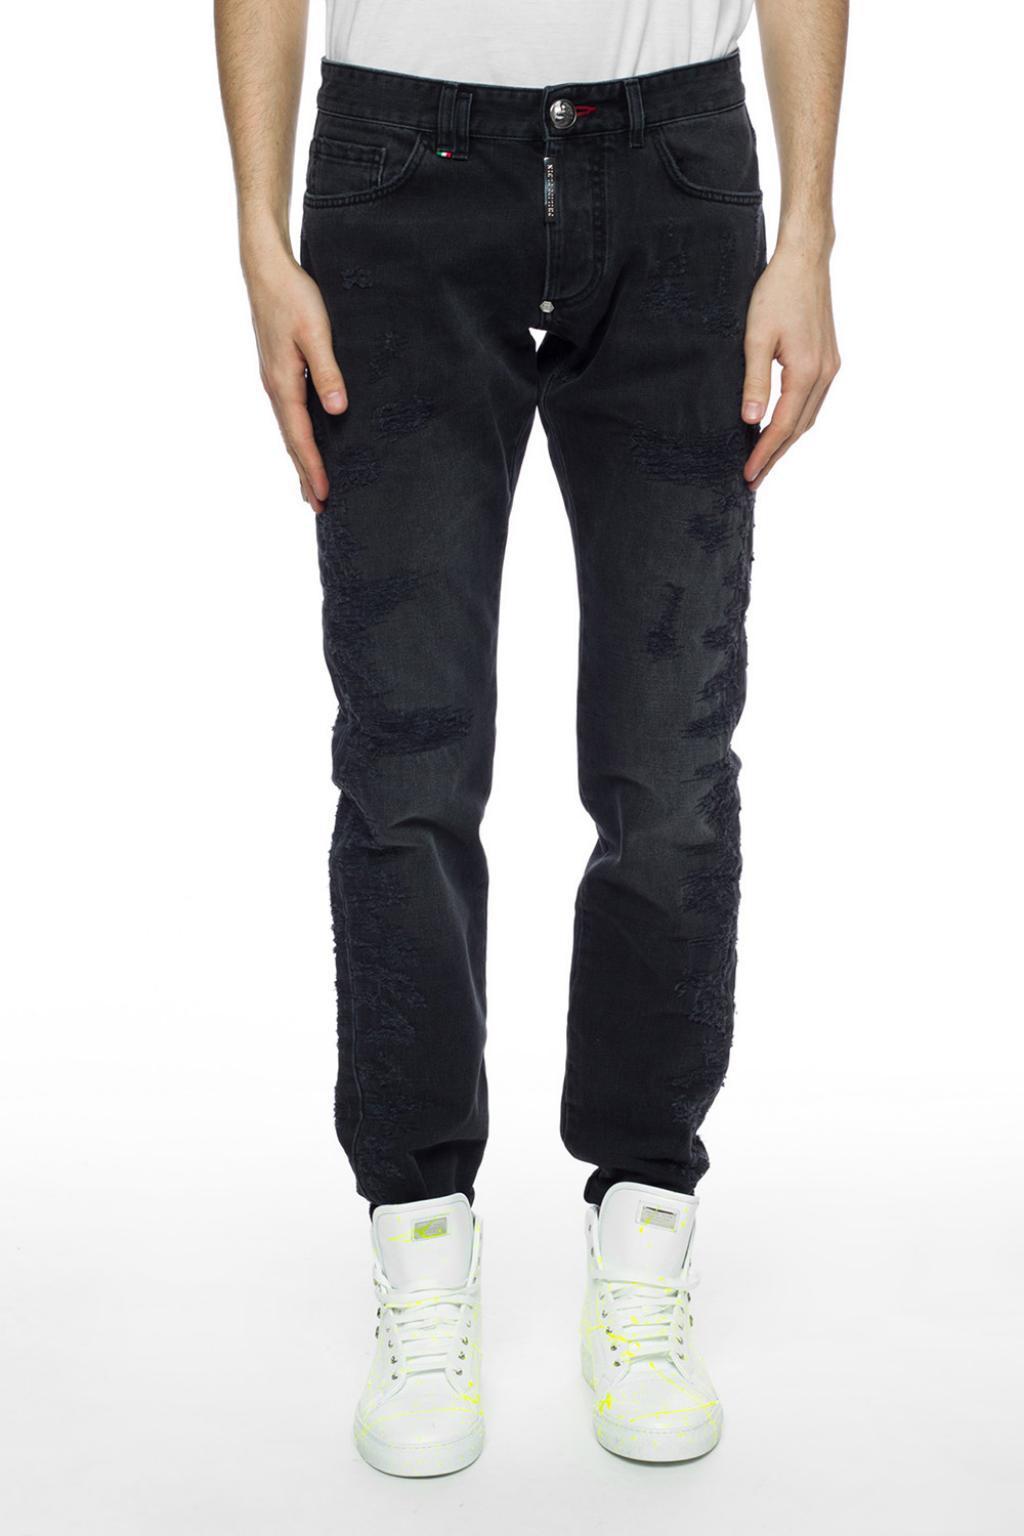 Philipp Plein Denim Distressed Jeans With Logo in Grey (Grey) for Men